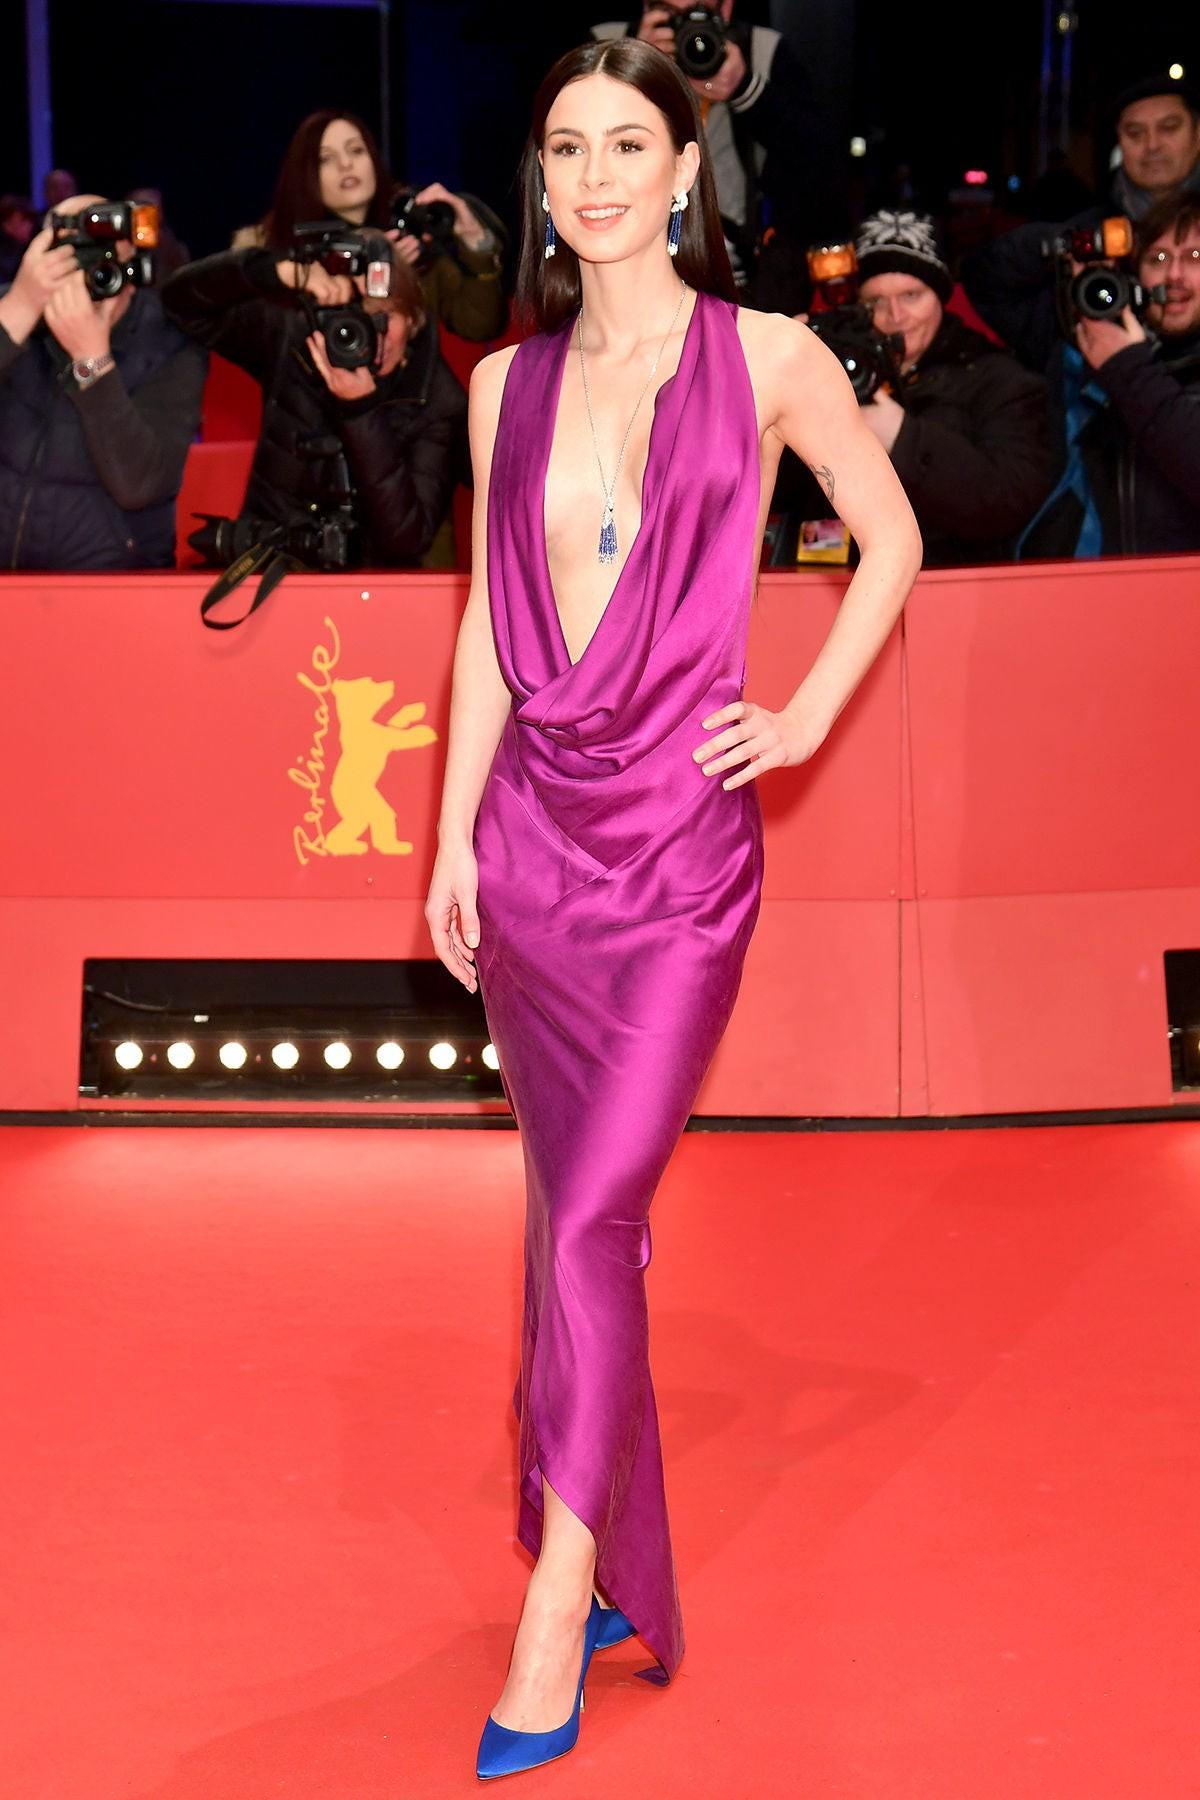 Lena Meyer-Landrut in Michael Sontag at 68. Berlinale, Red